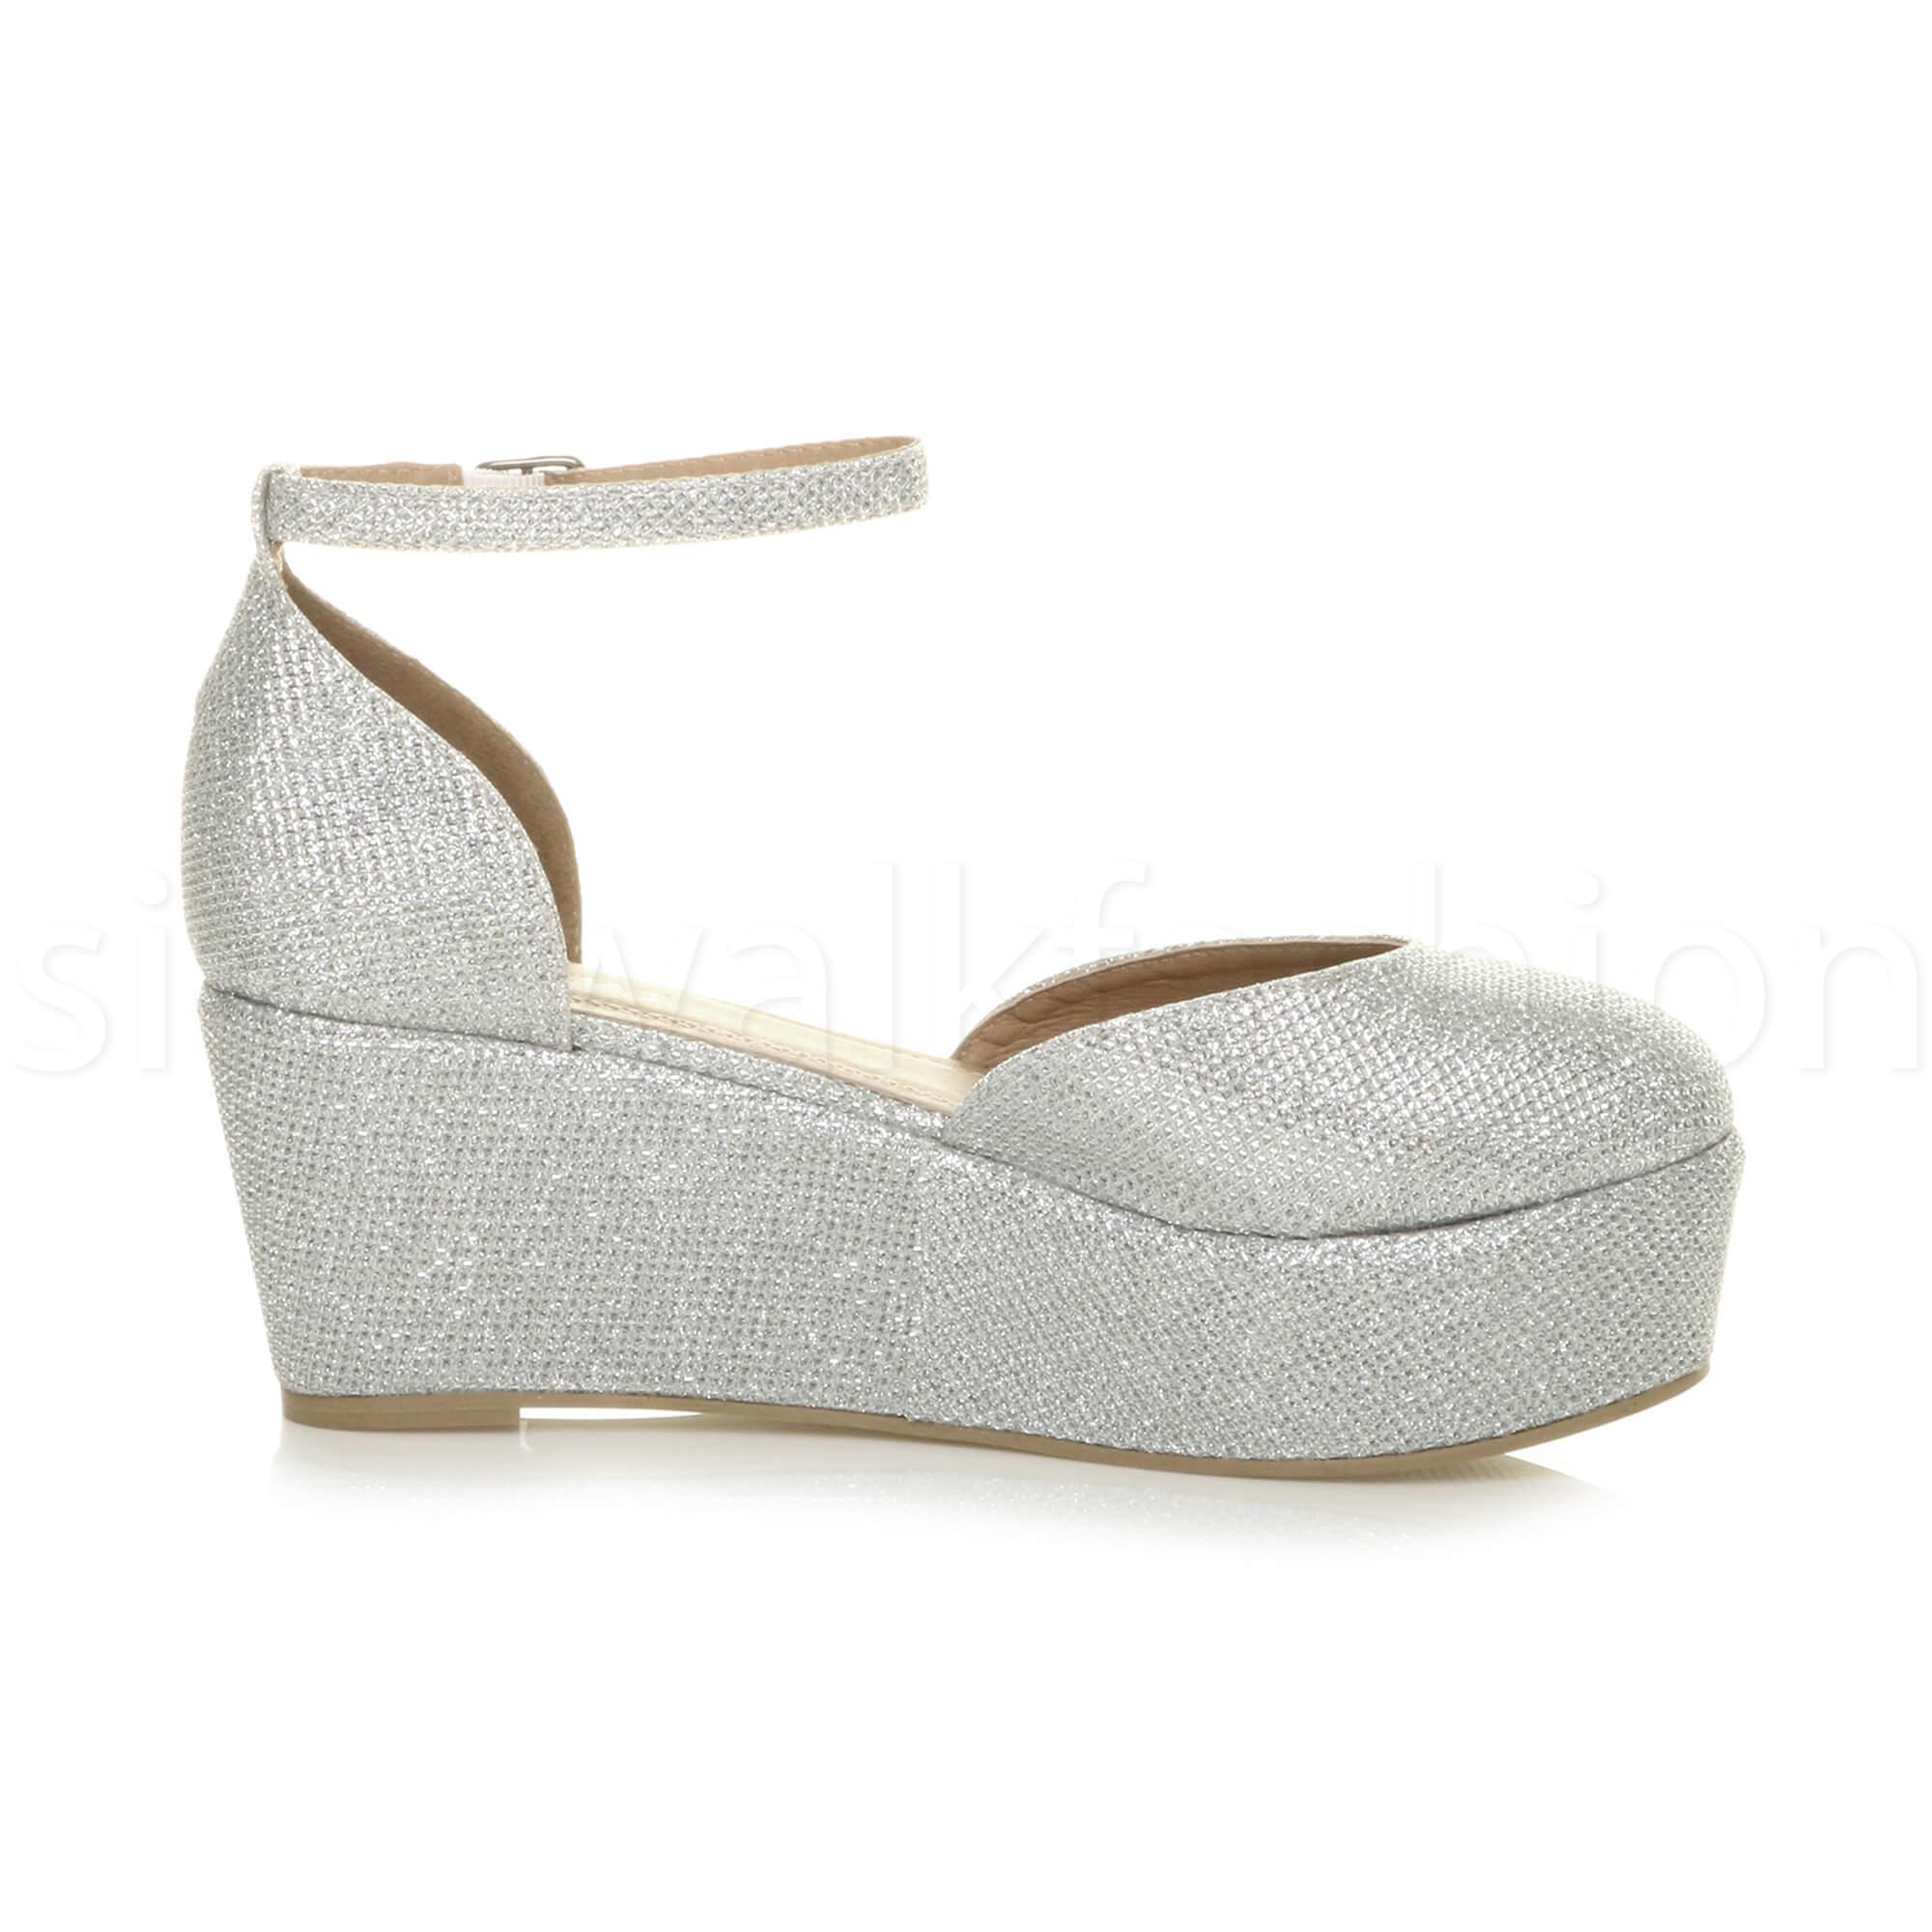 Womens-ladies-flatform-mid-wedge-ankle-strap-platform-court-shoes-sandals-size thumbnail 68